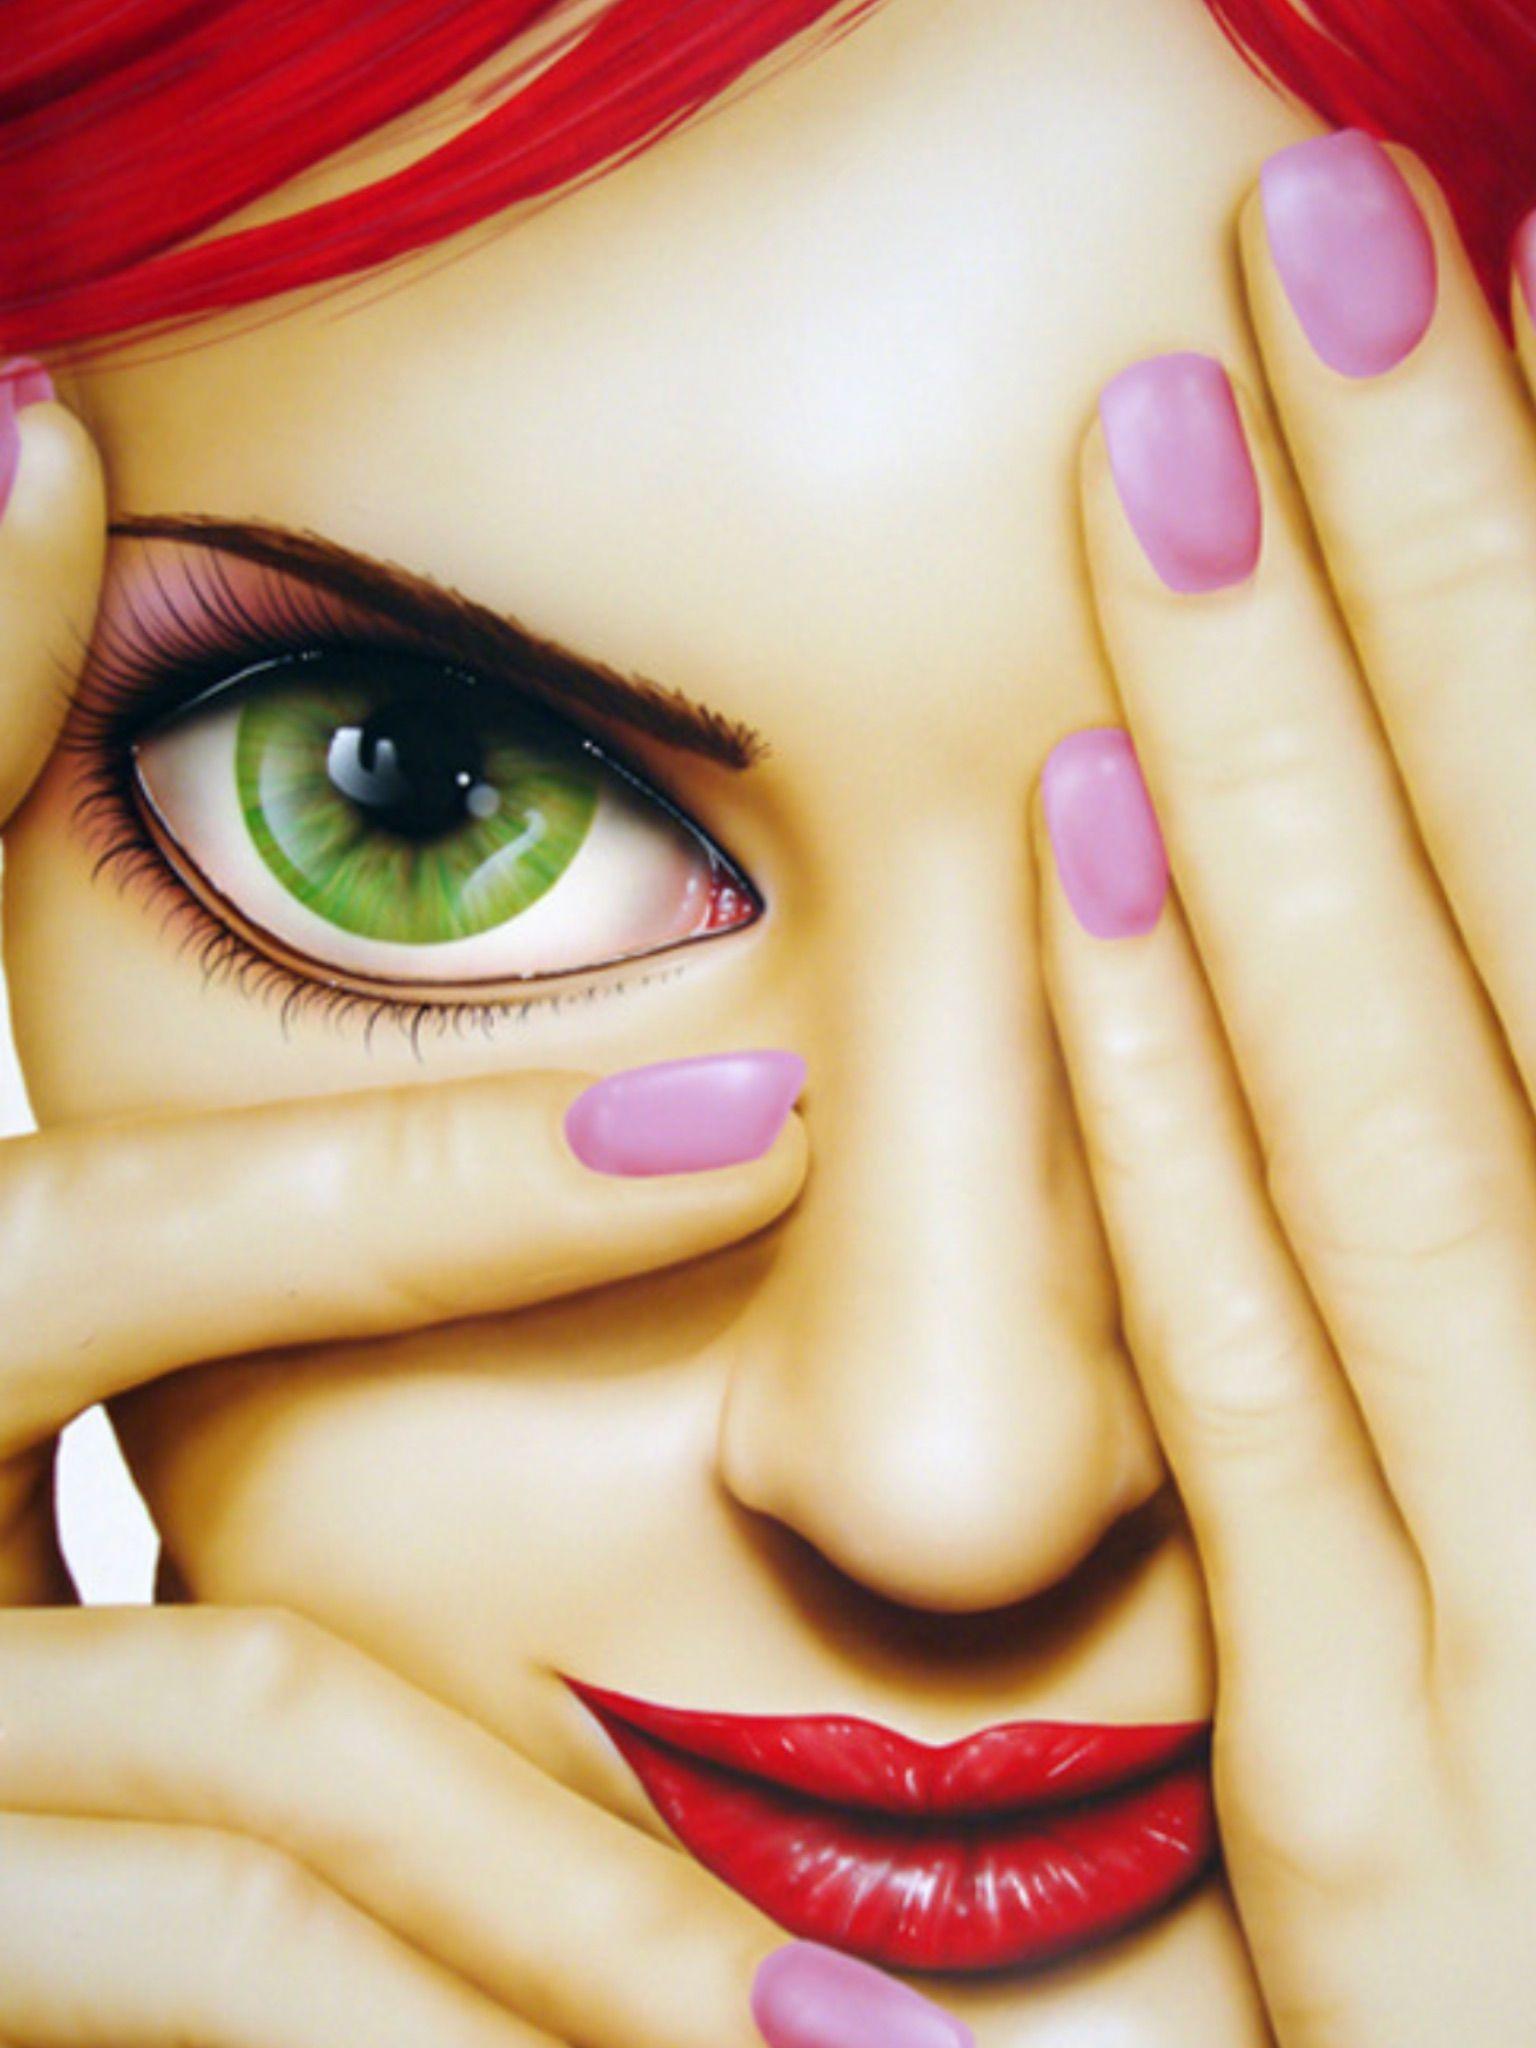 Pin By Jelena On Illustrations Arts Art Colorful Art Face Art